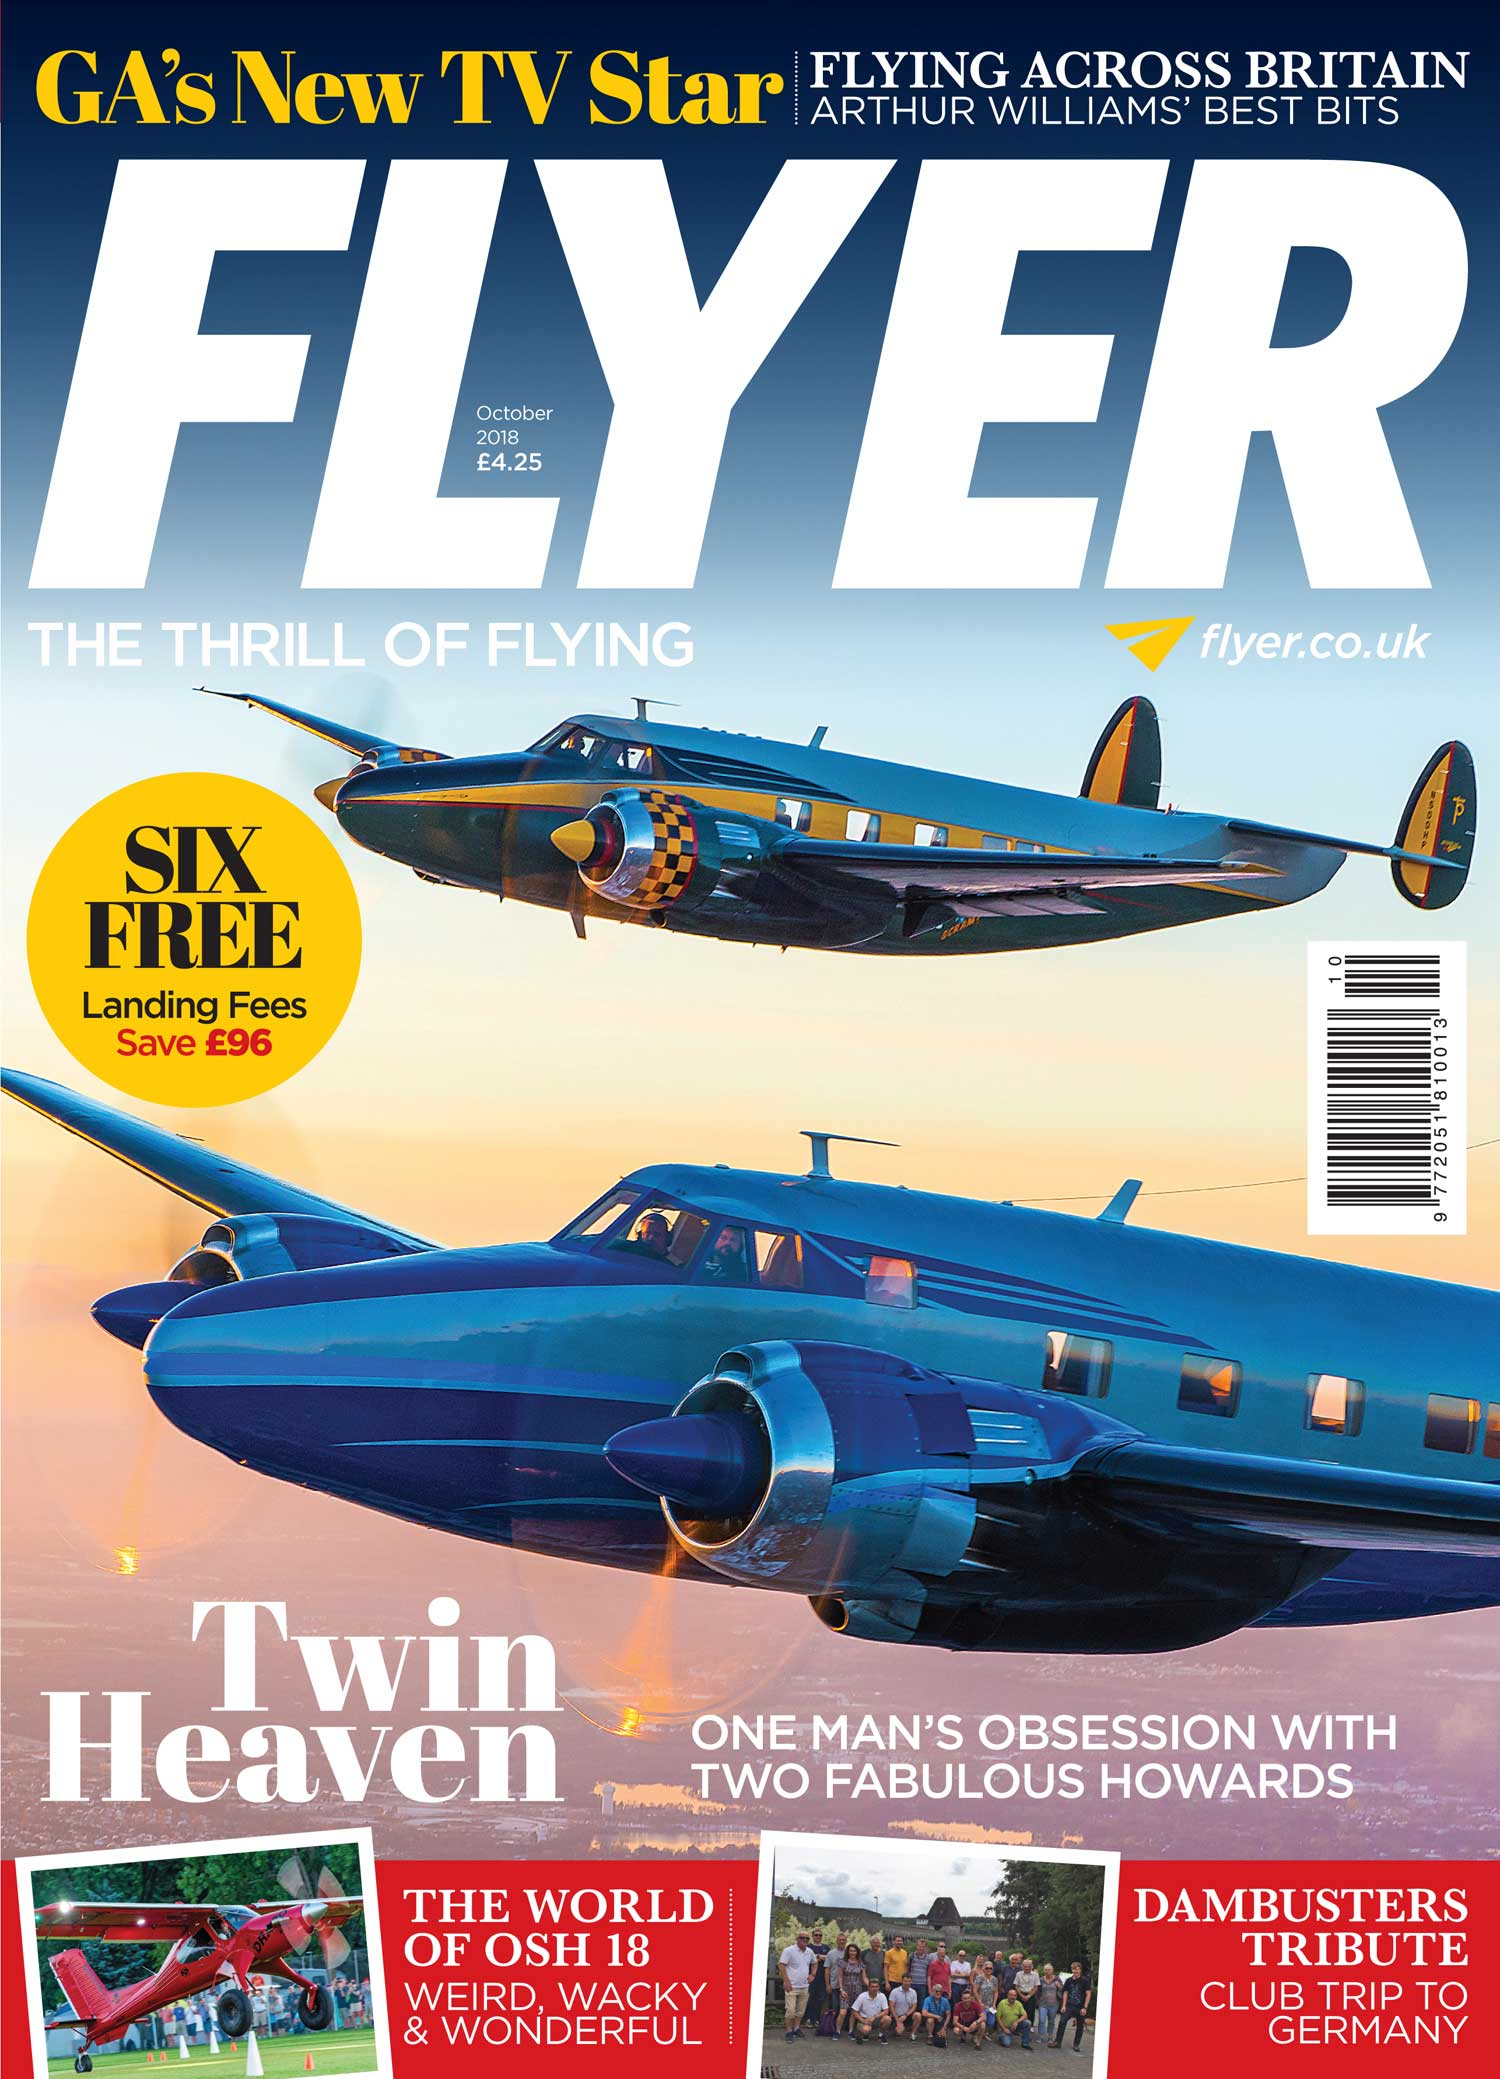 FLYER October 2018 - FLYER